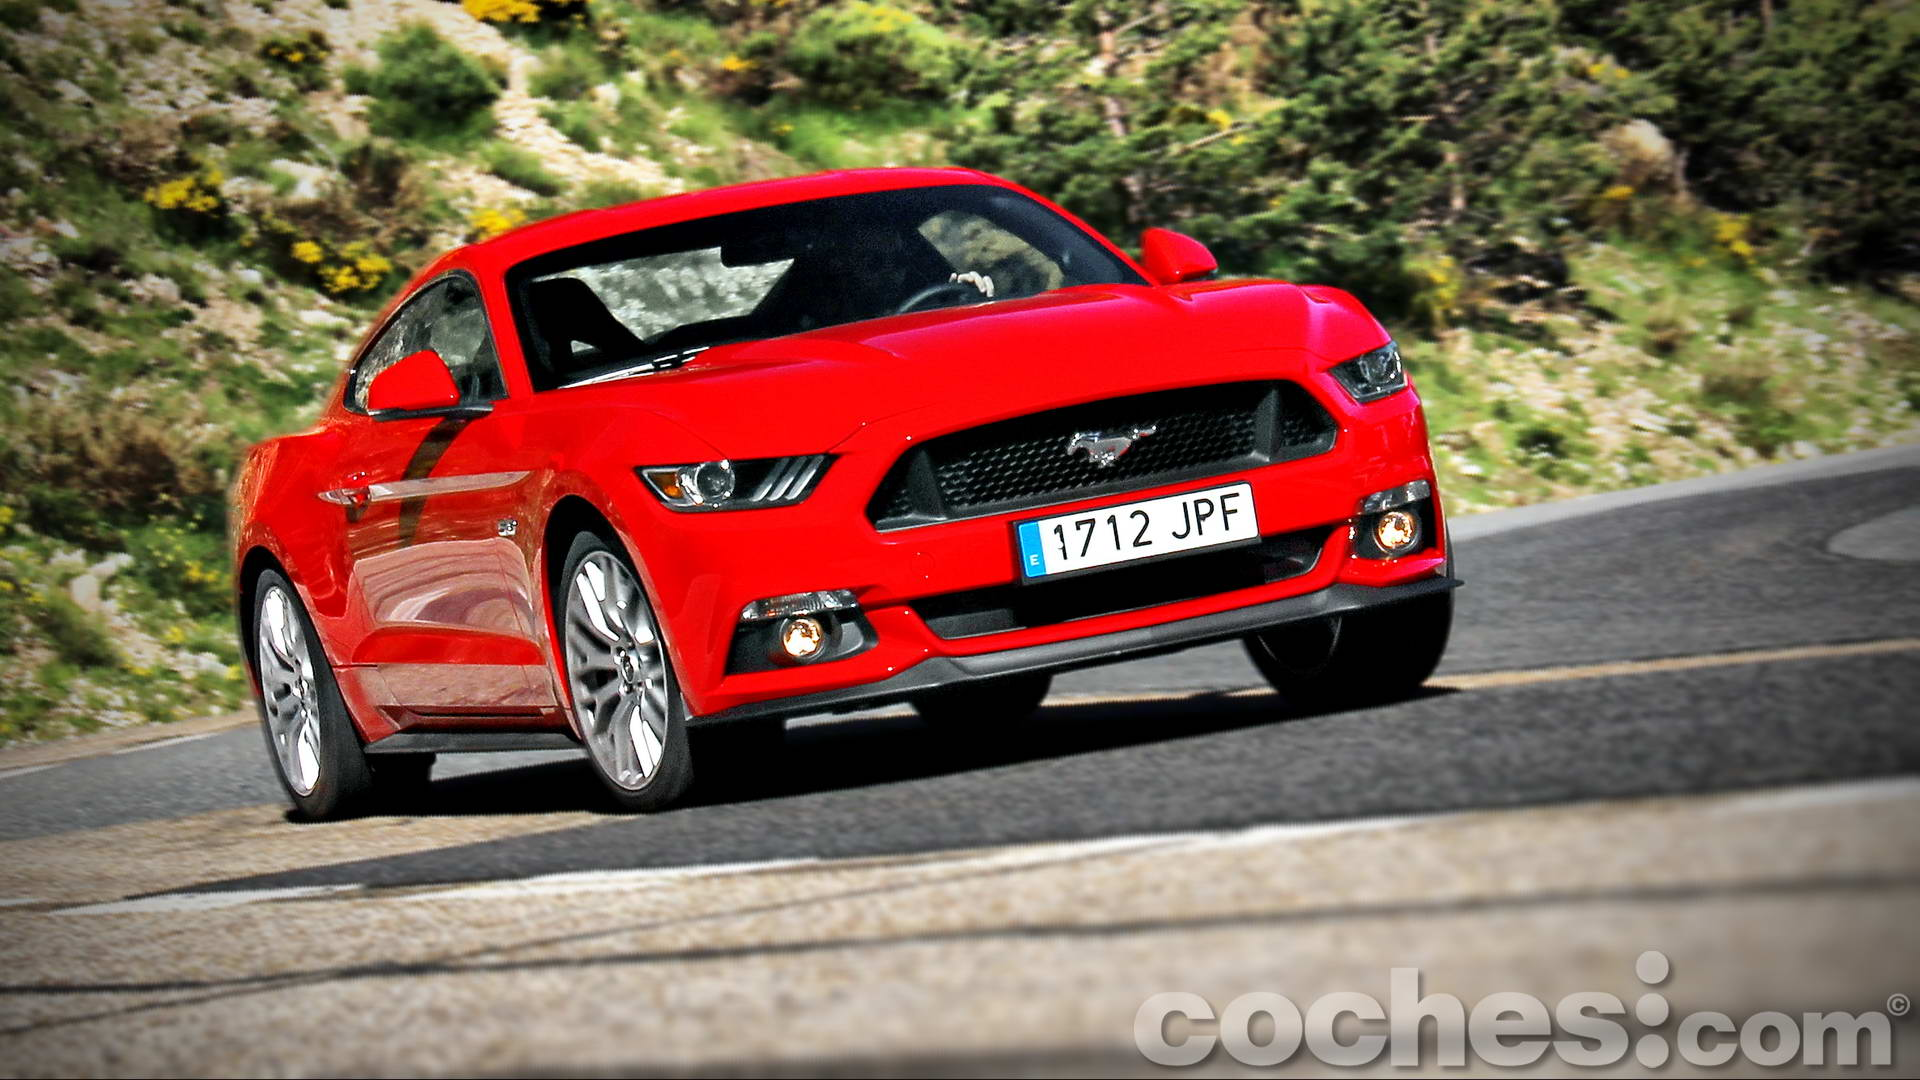 Ford_Mustang_Fastback_GT_5.0_V8_102